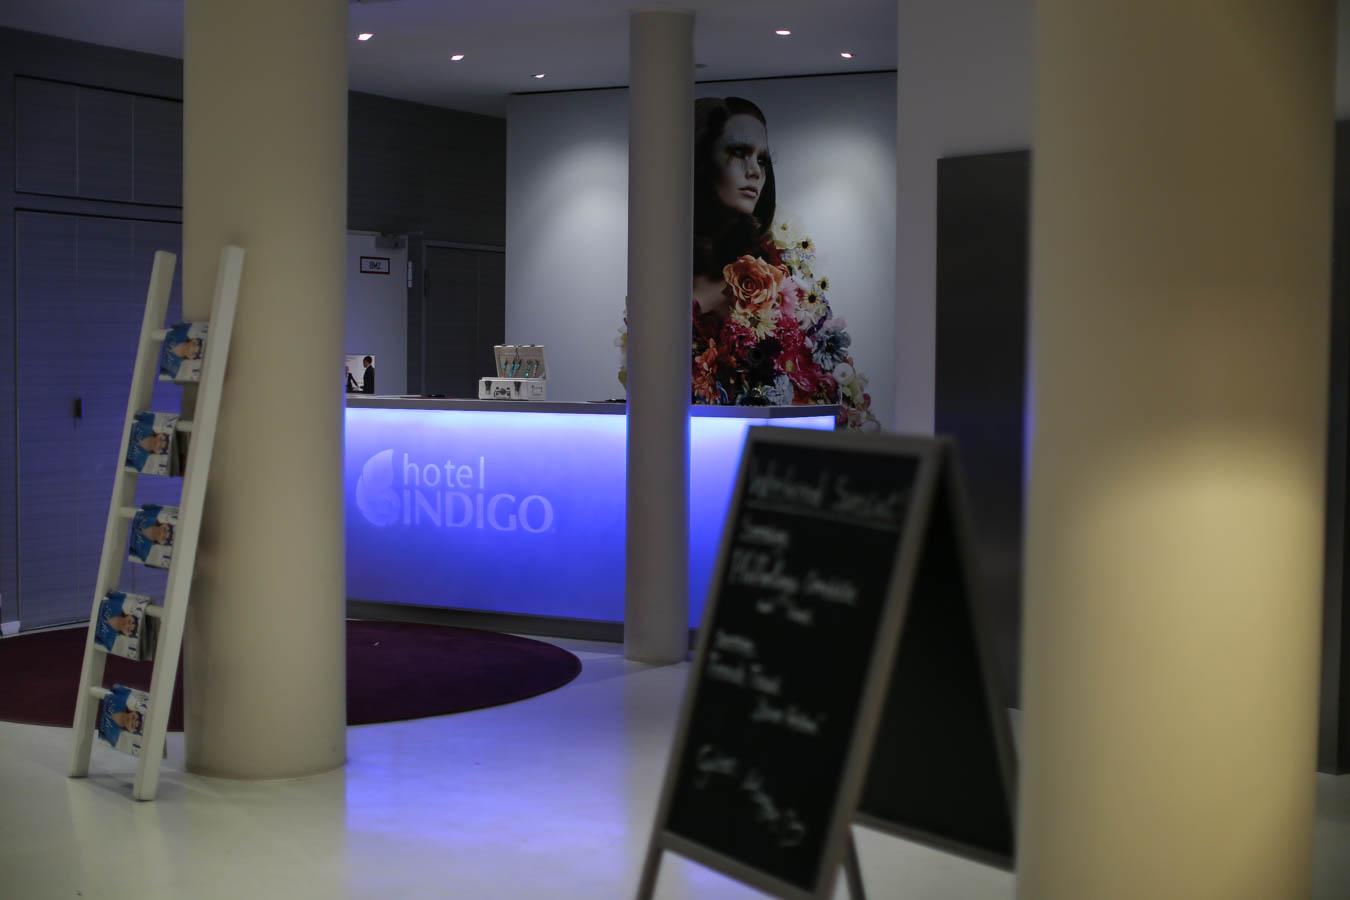 Indigo Hotel Düsseldorf